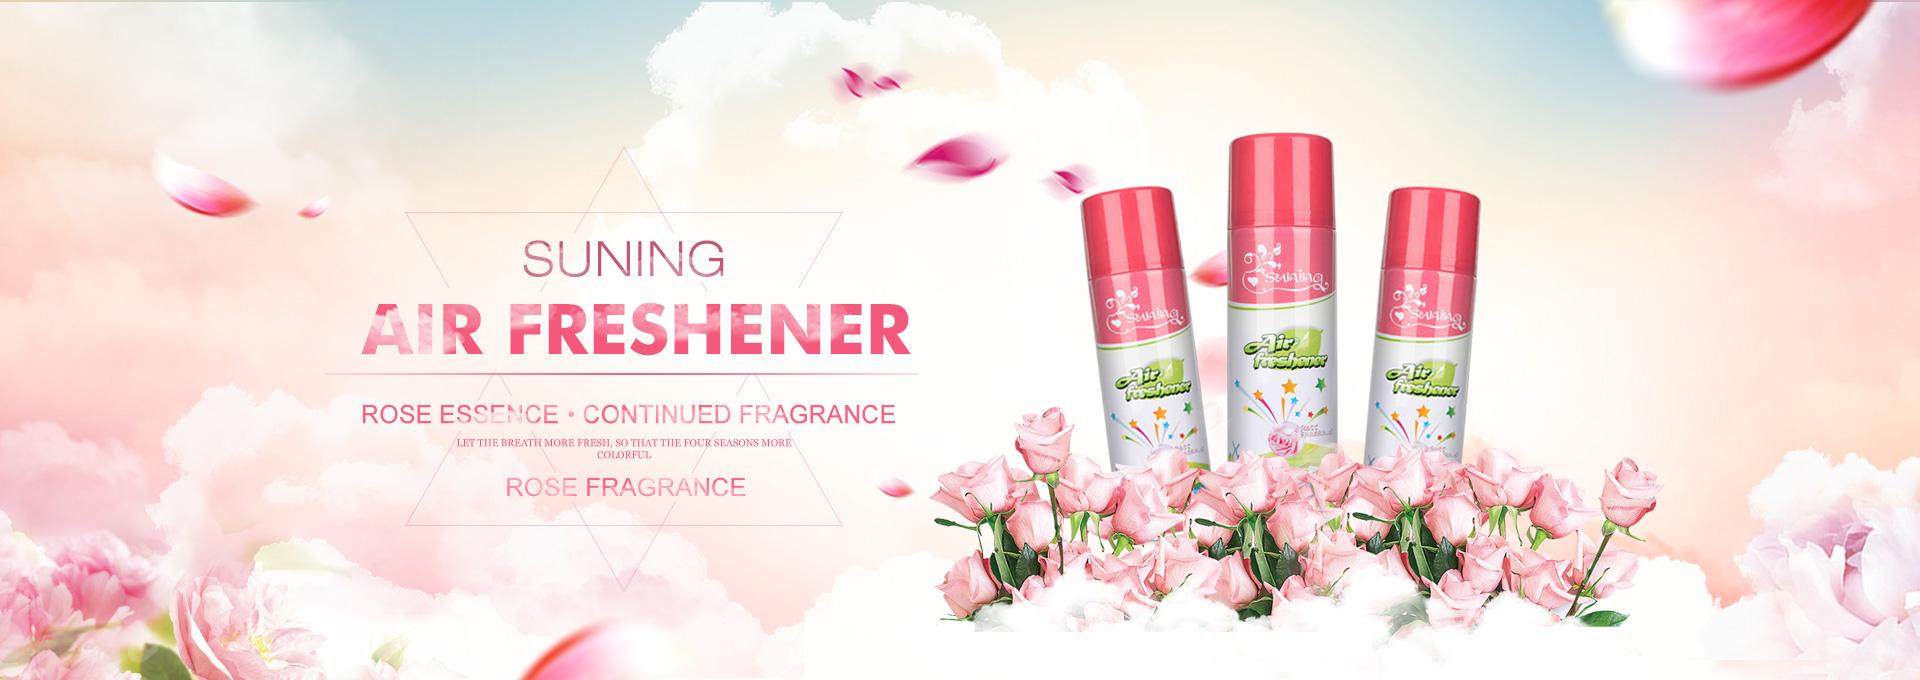 air freshener rose 340ml SUNING